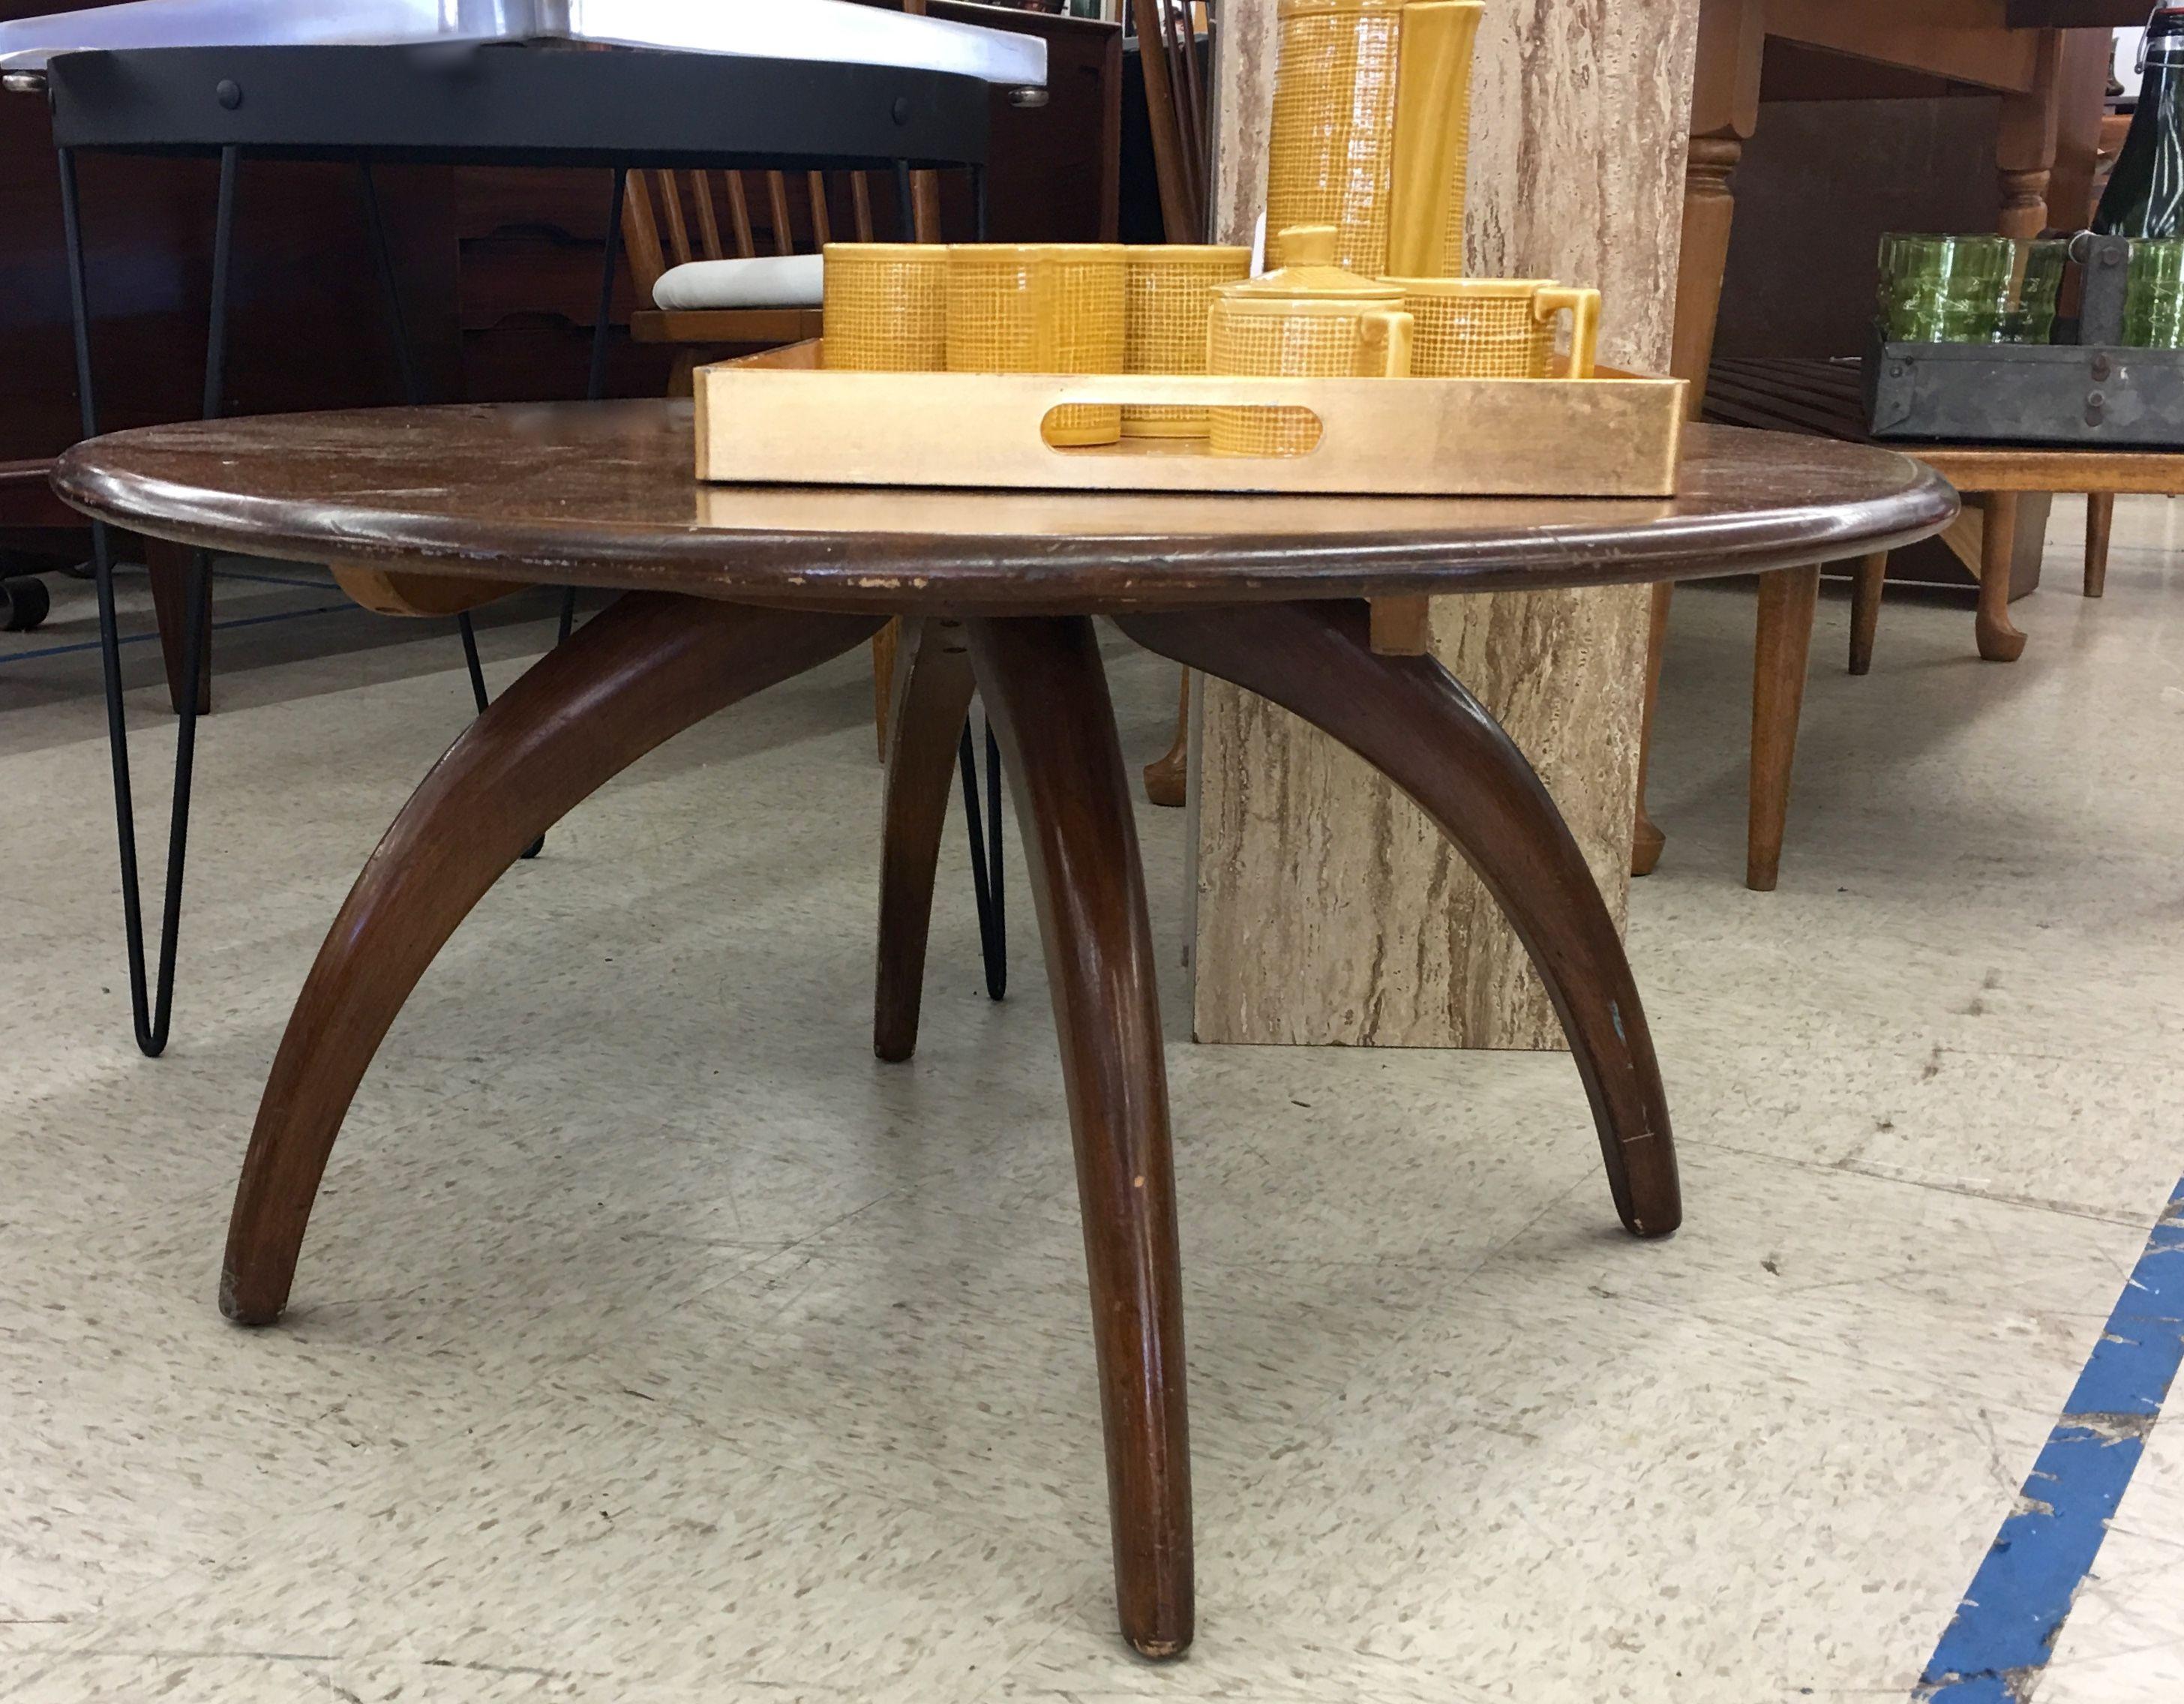 Heywood wakefield lazy susan coffee table 32 diameter x